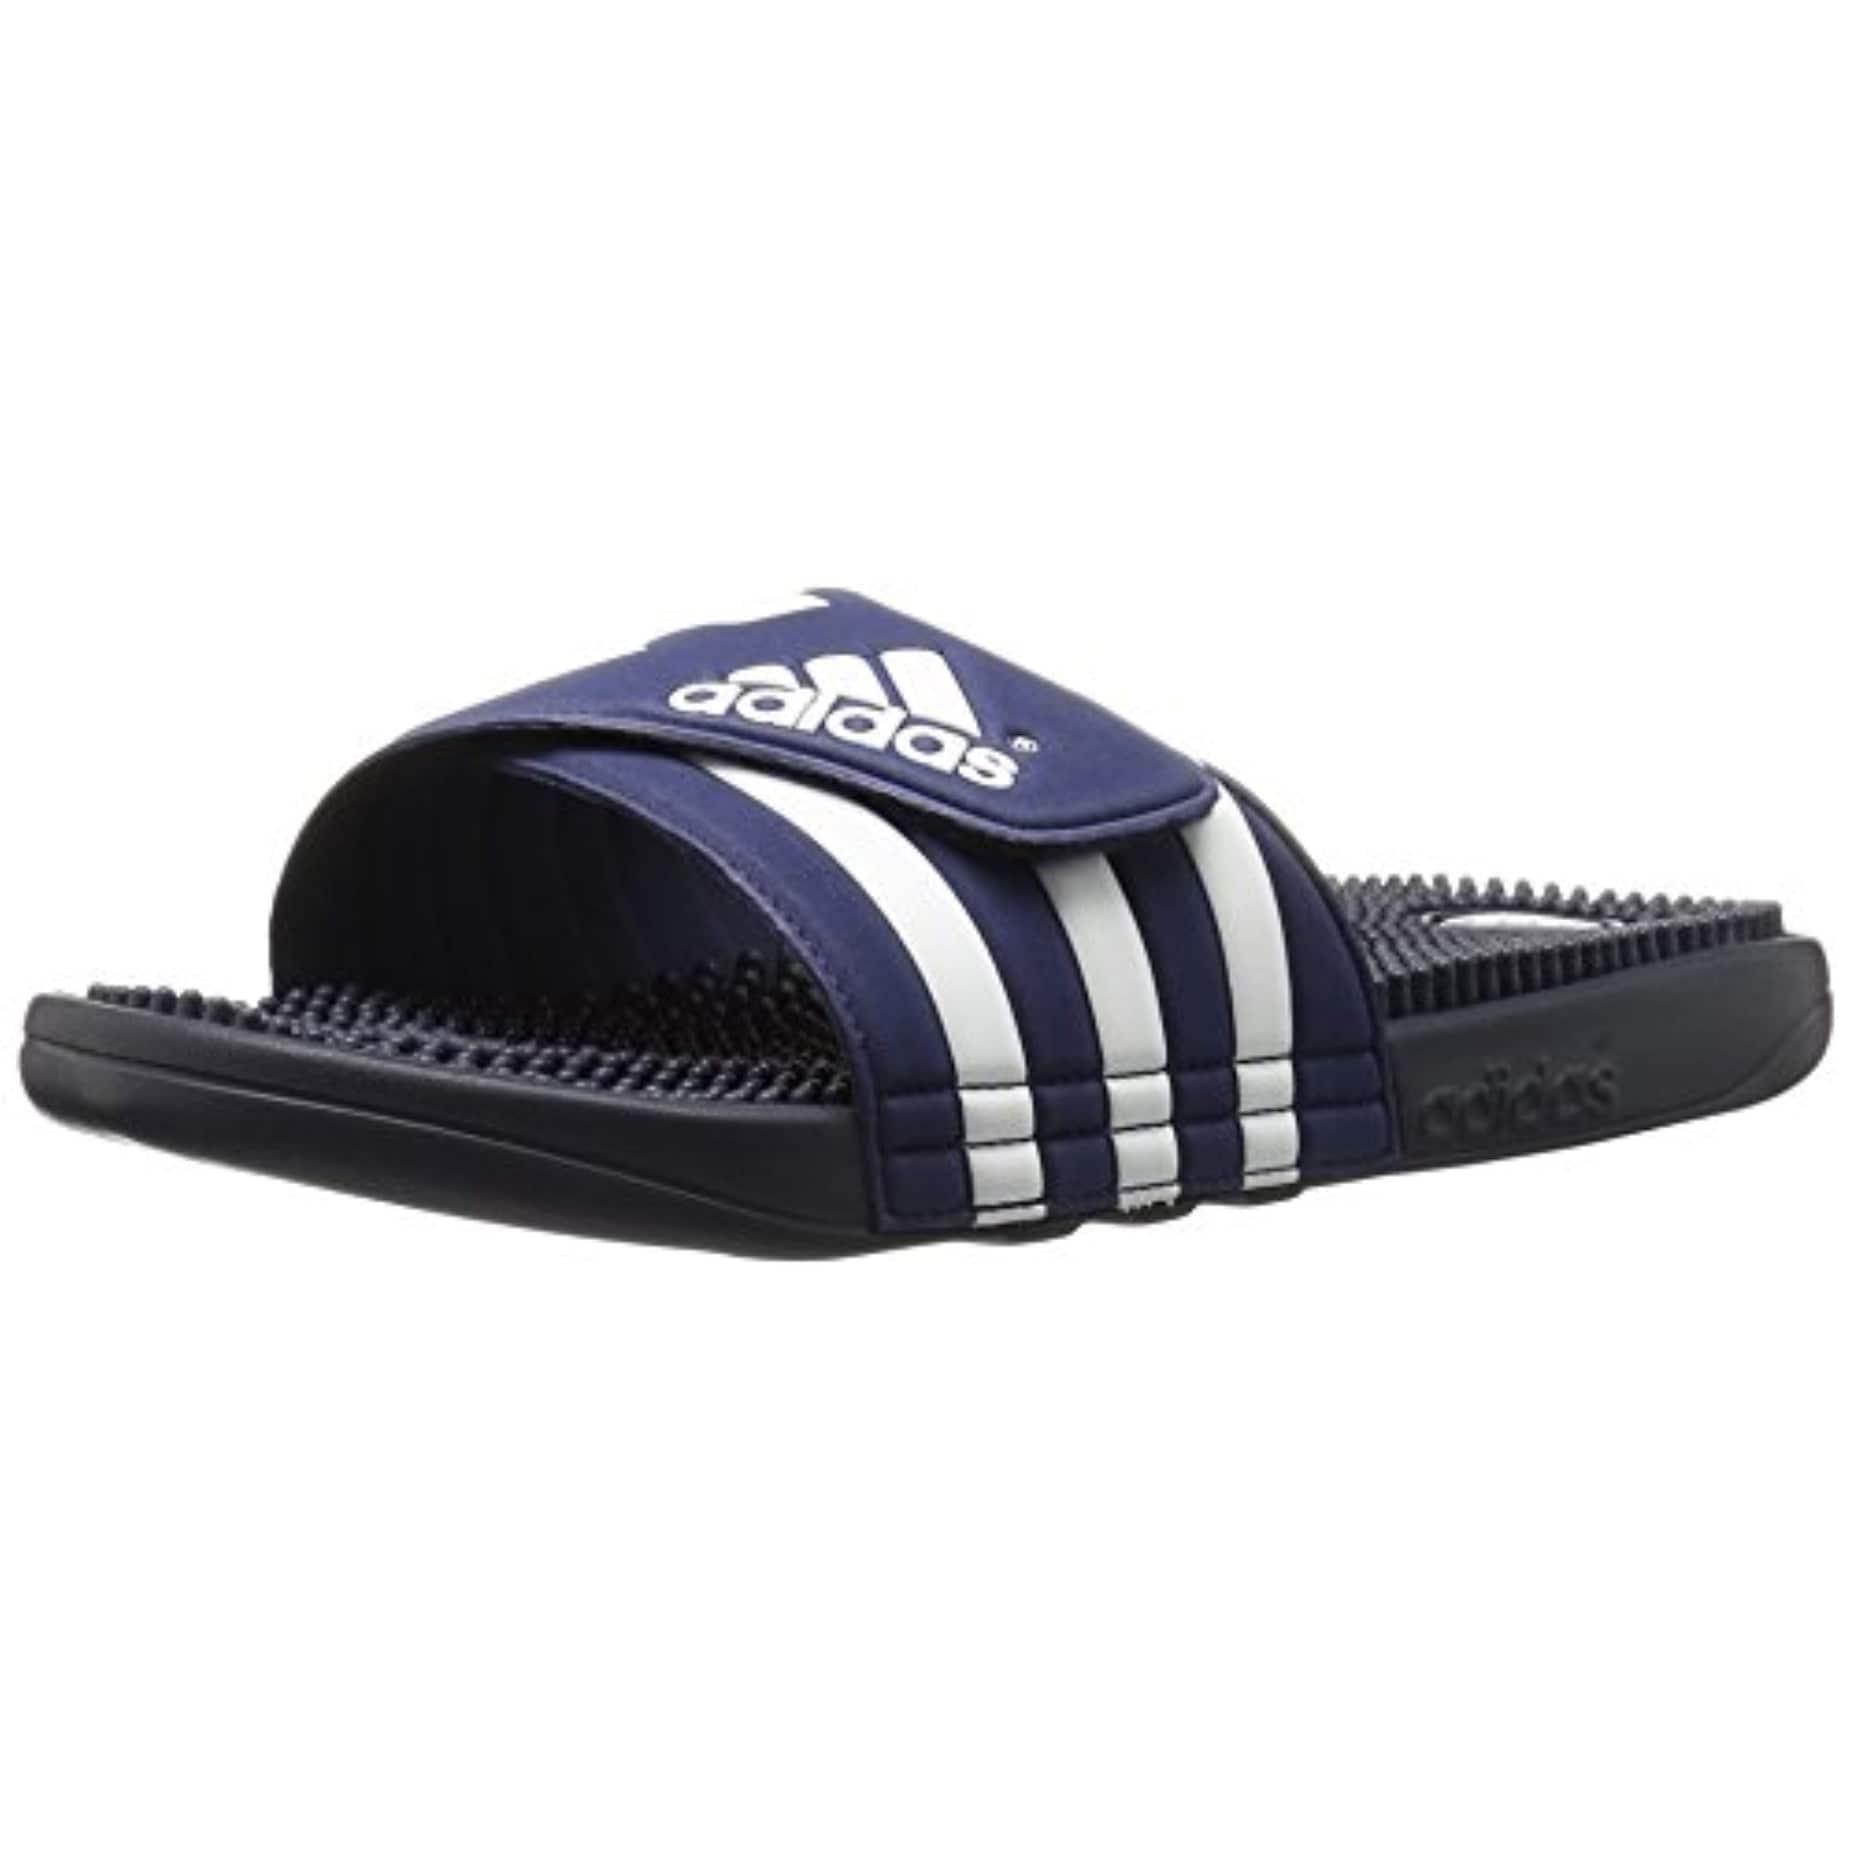 the best attitude c2ece dffd9 Shop Adidas Originals Men s Adissage Slides,New Navy New Navy Running White  - Free Shipping Today - Overstock - 27121344